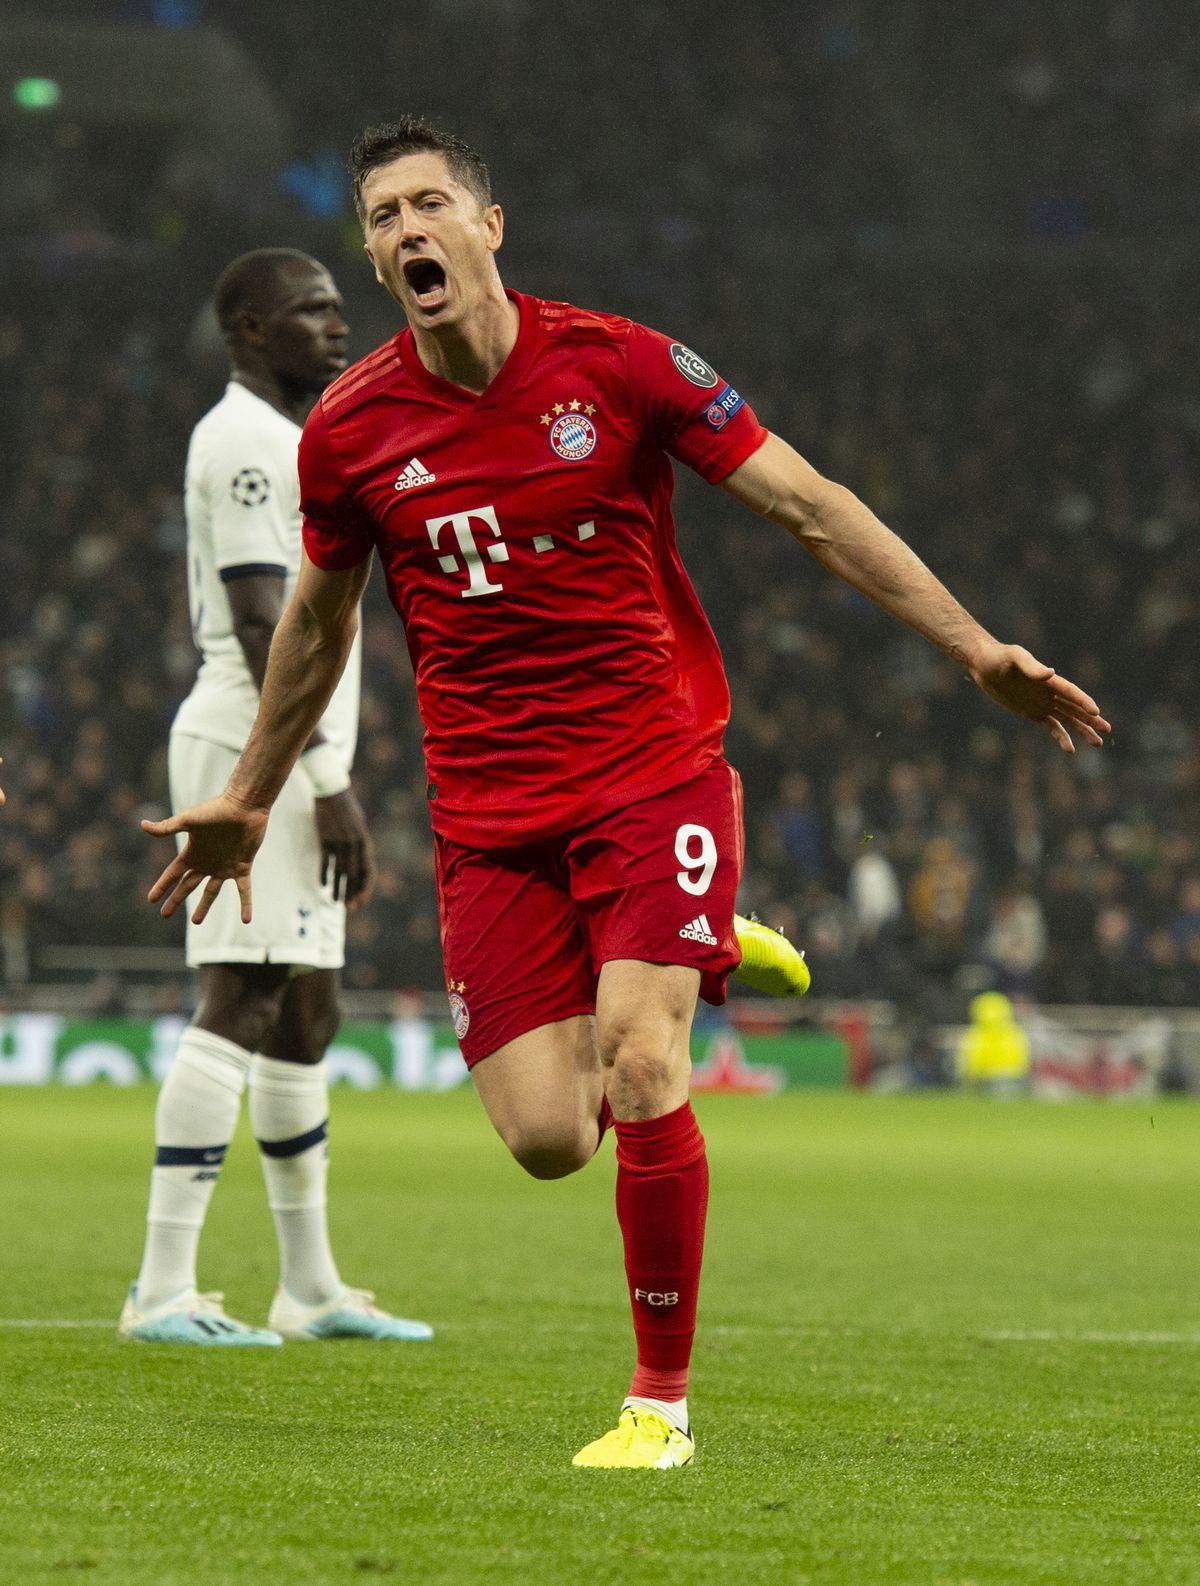 Tottenham Hotspur v Bayern Munchen: Group B - UEFA Champions League